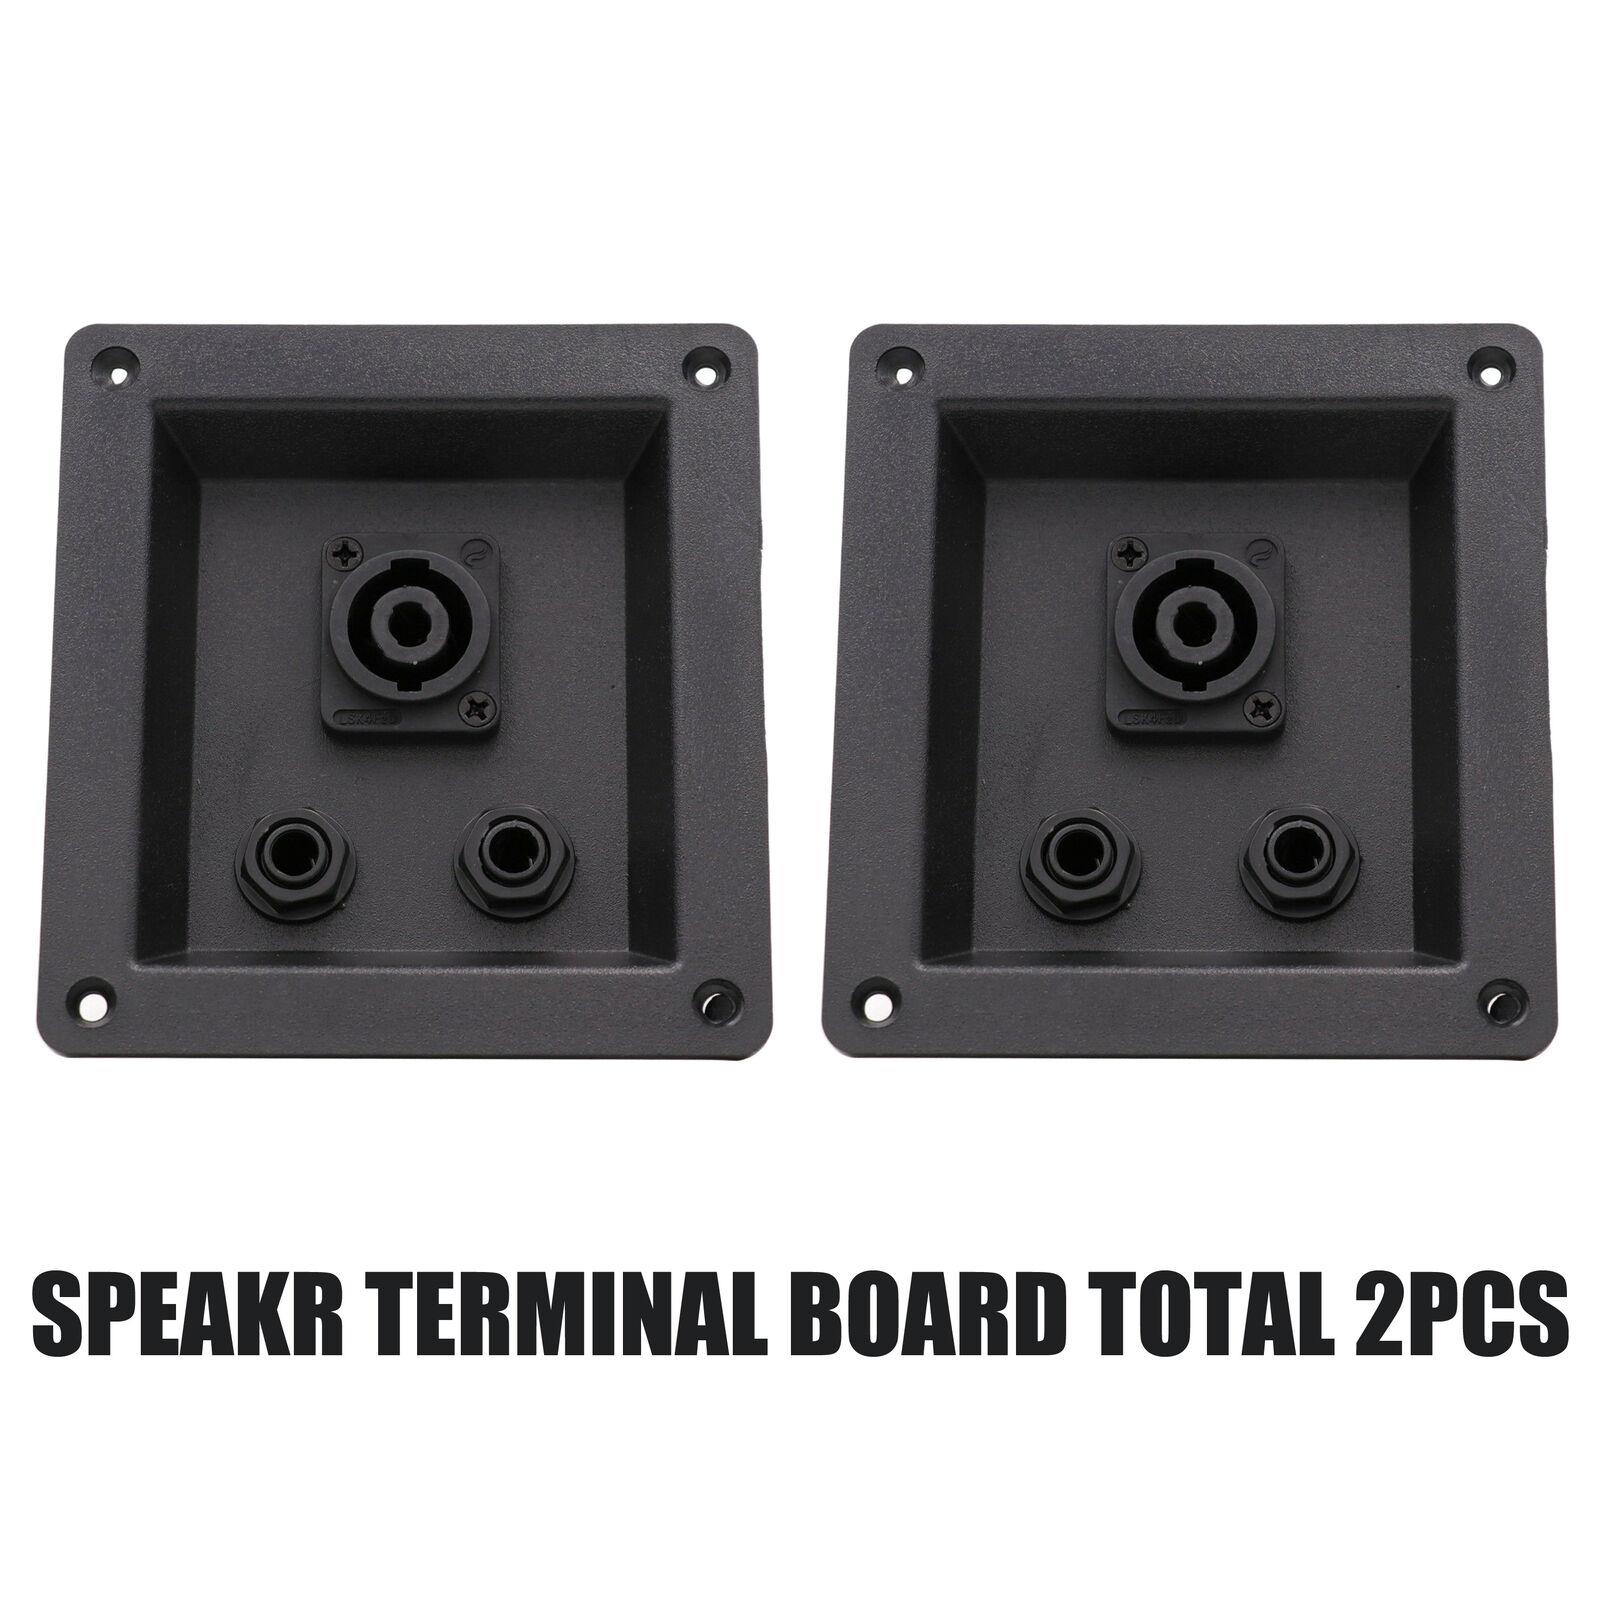 2PCS SPEAKER TERMINAL BOARD 109x99mm Plastic Stage Loudspeaker Jack Socket Board With Speakon Connector 1/4